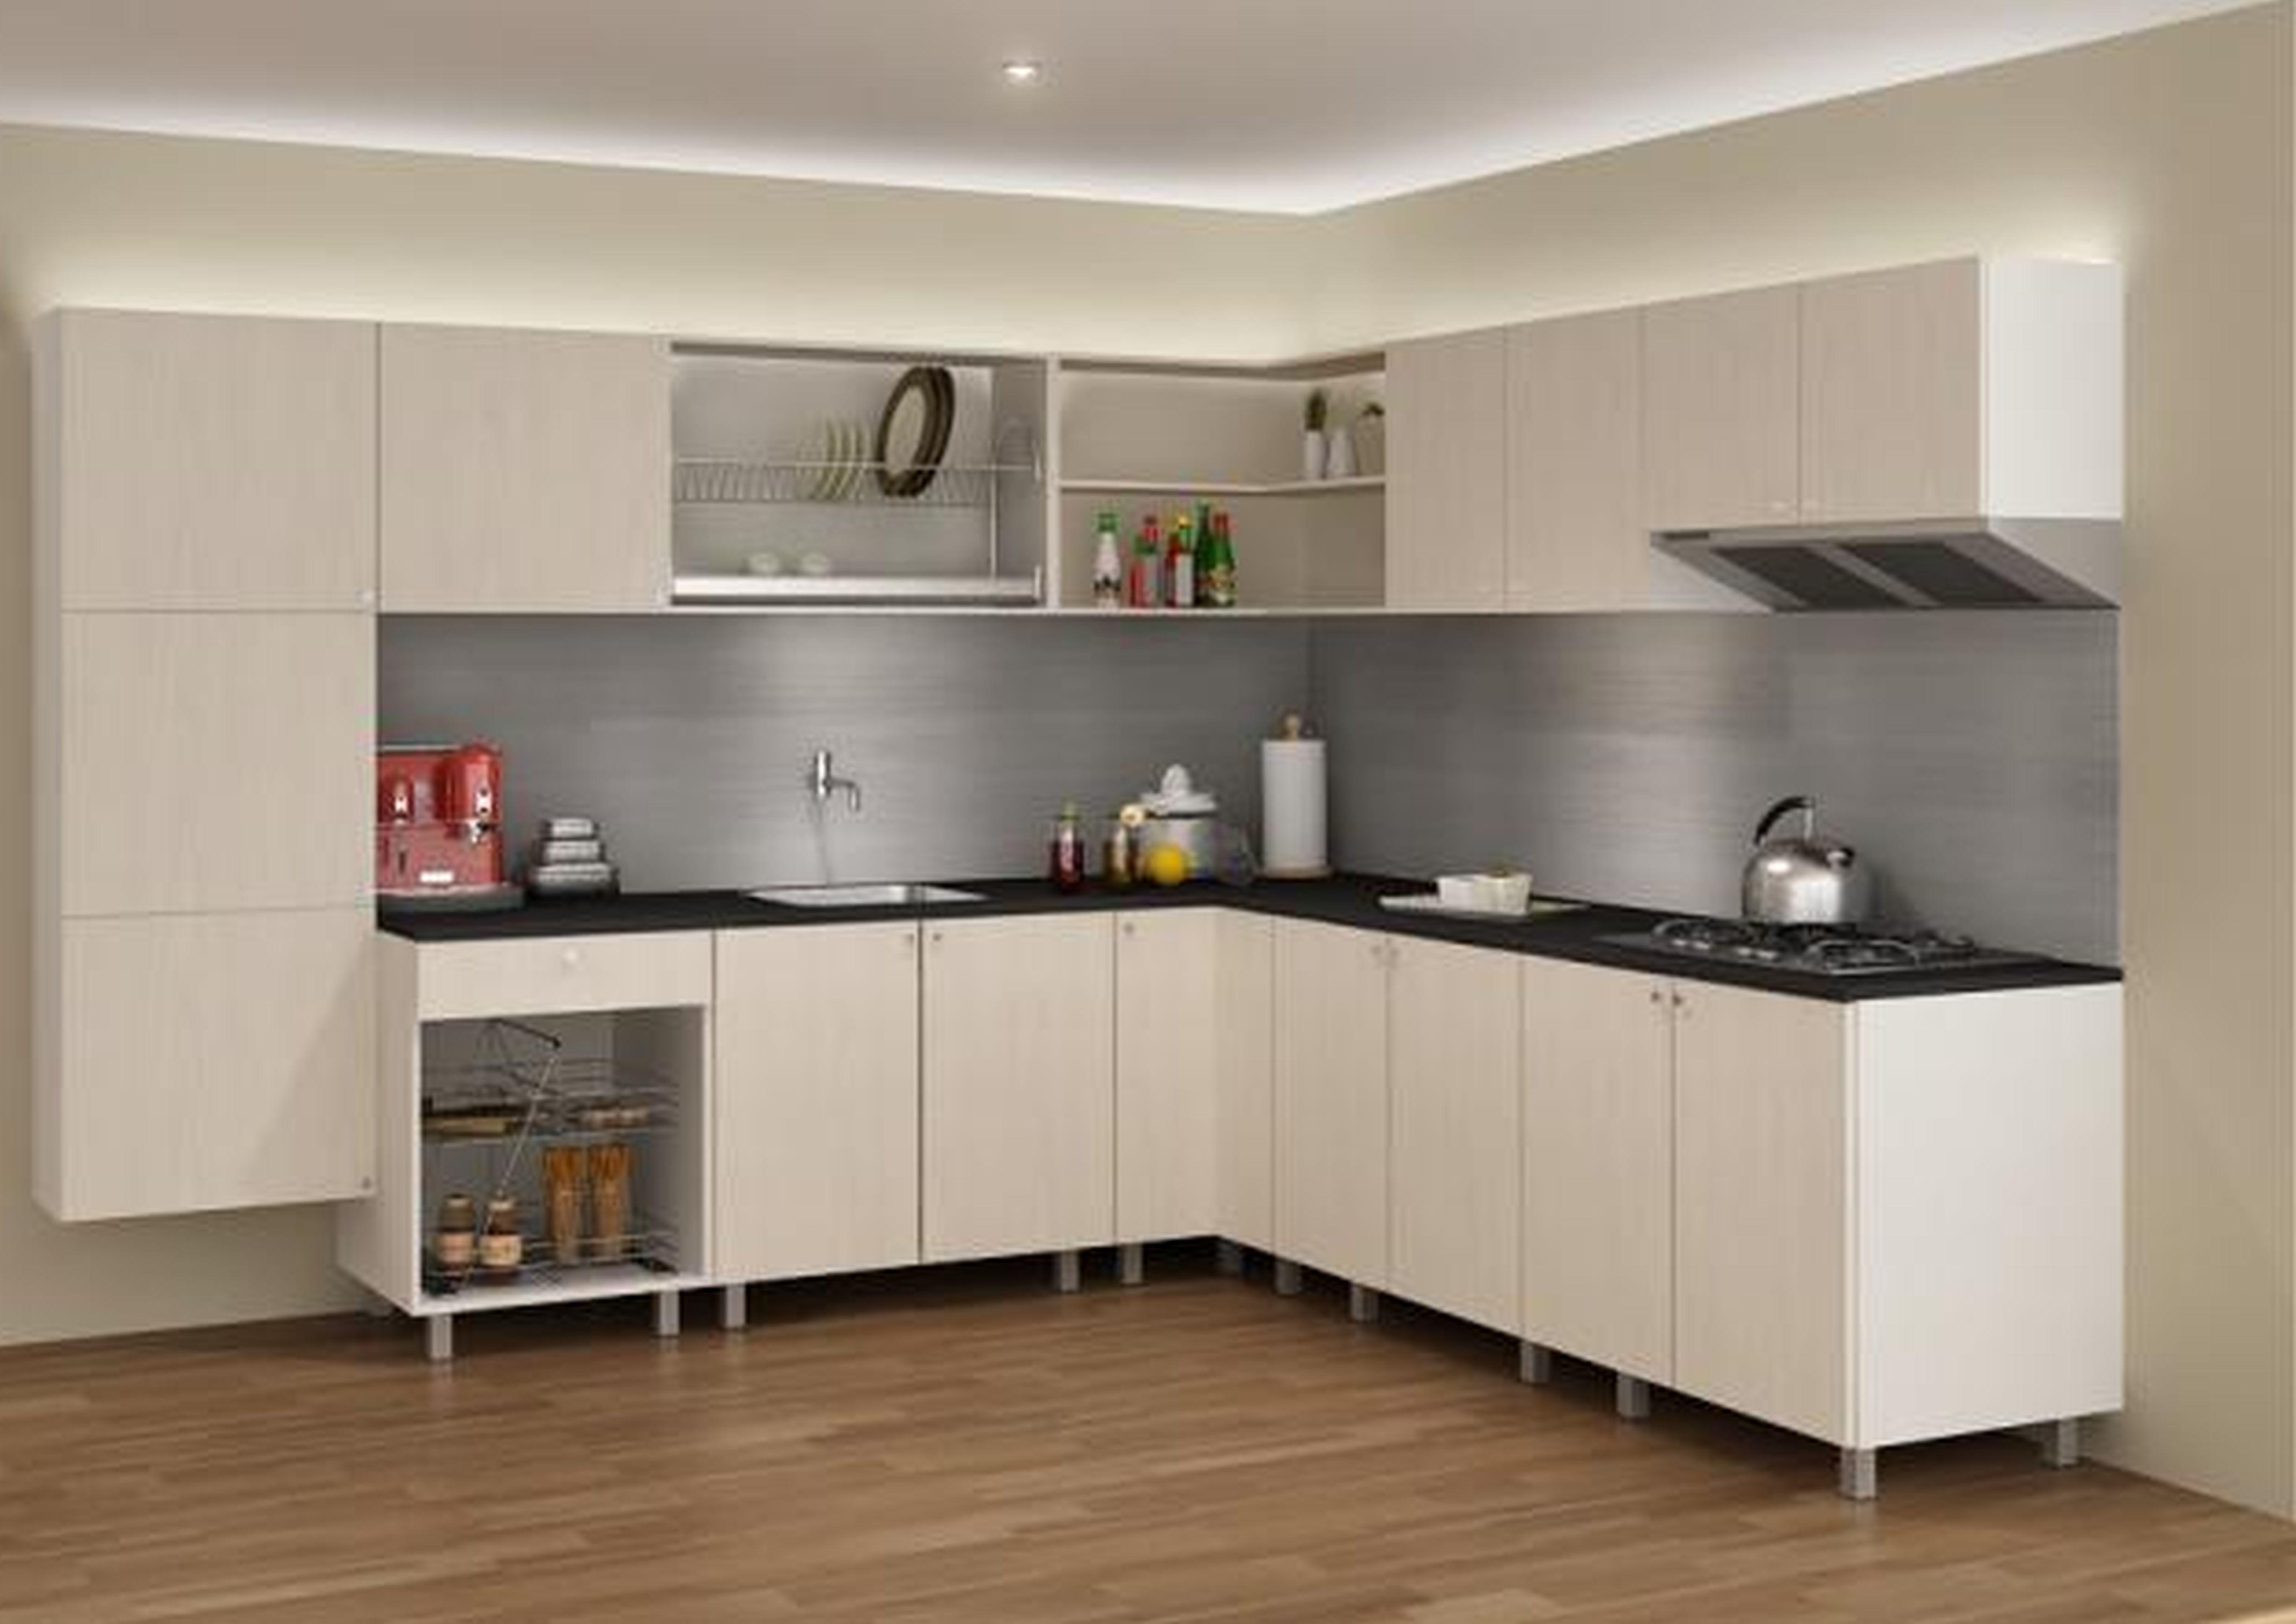 Wall Mounted Kitchen Cabinets Kitchen Design Small Cheap Kitchen Cabinets Kitchen Layout